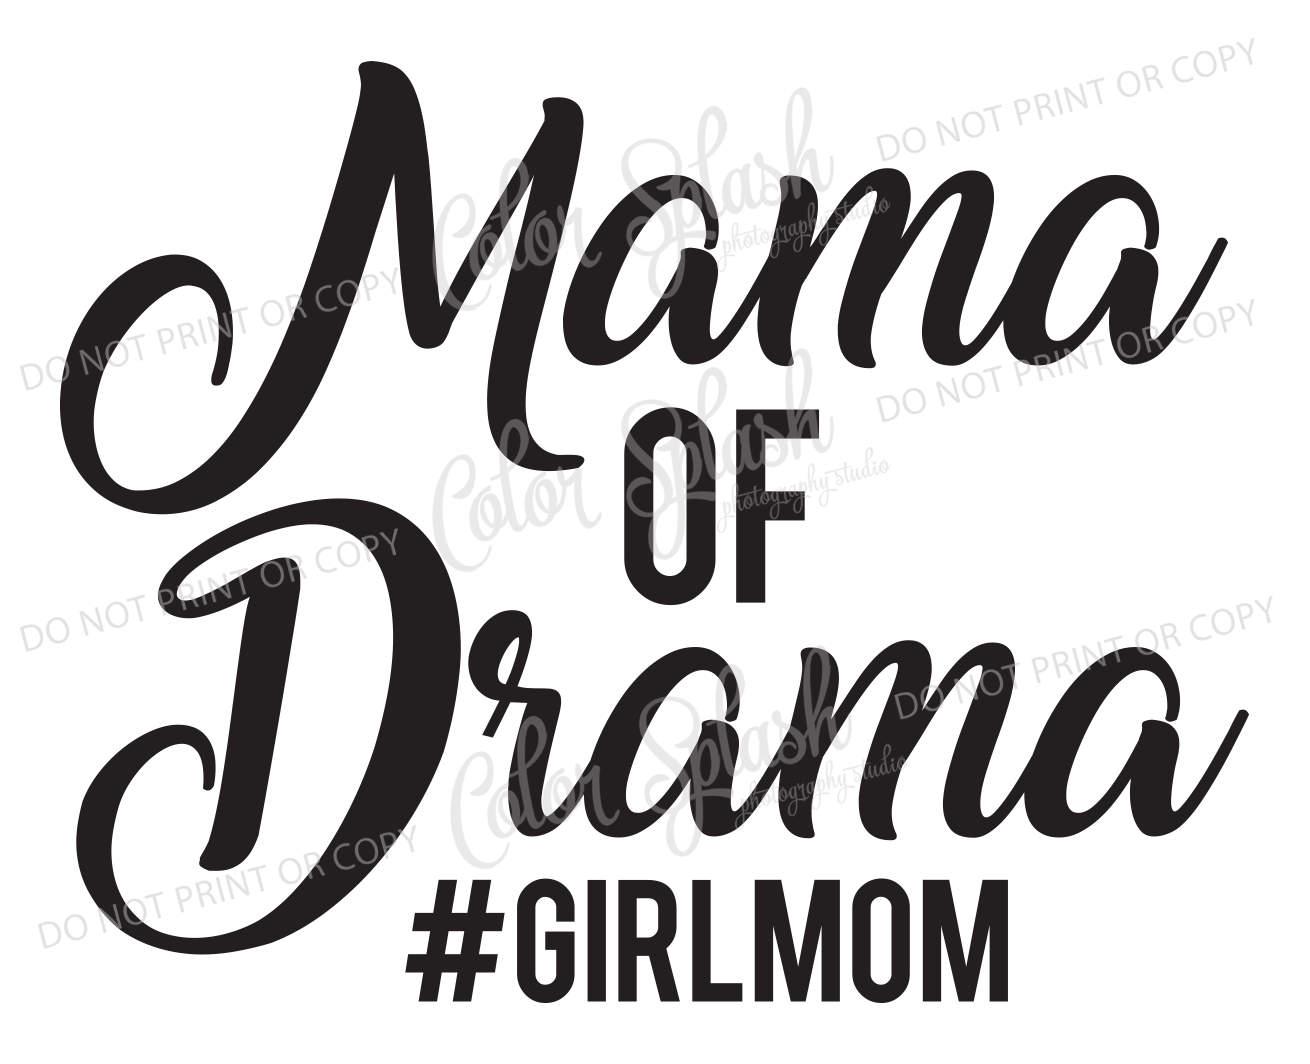 mama of drama girl mom svg dxf eps cutting file etsy Popular Tech 50